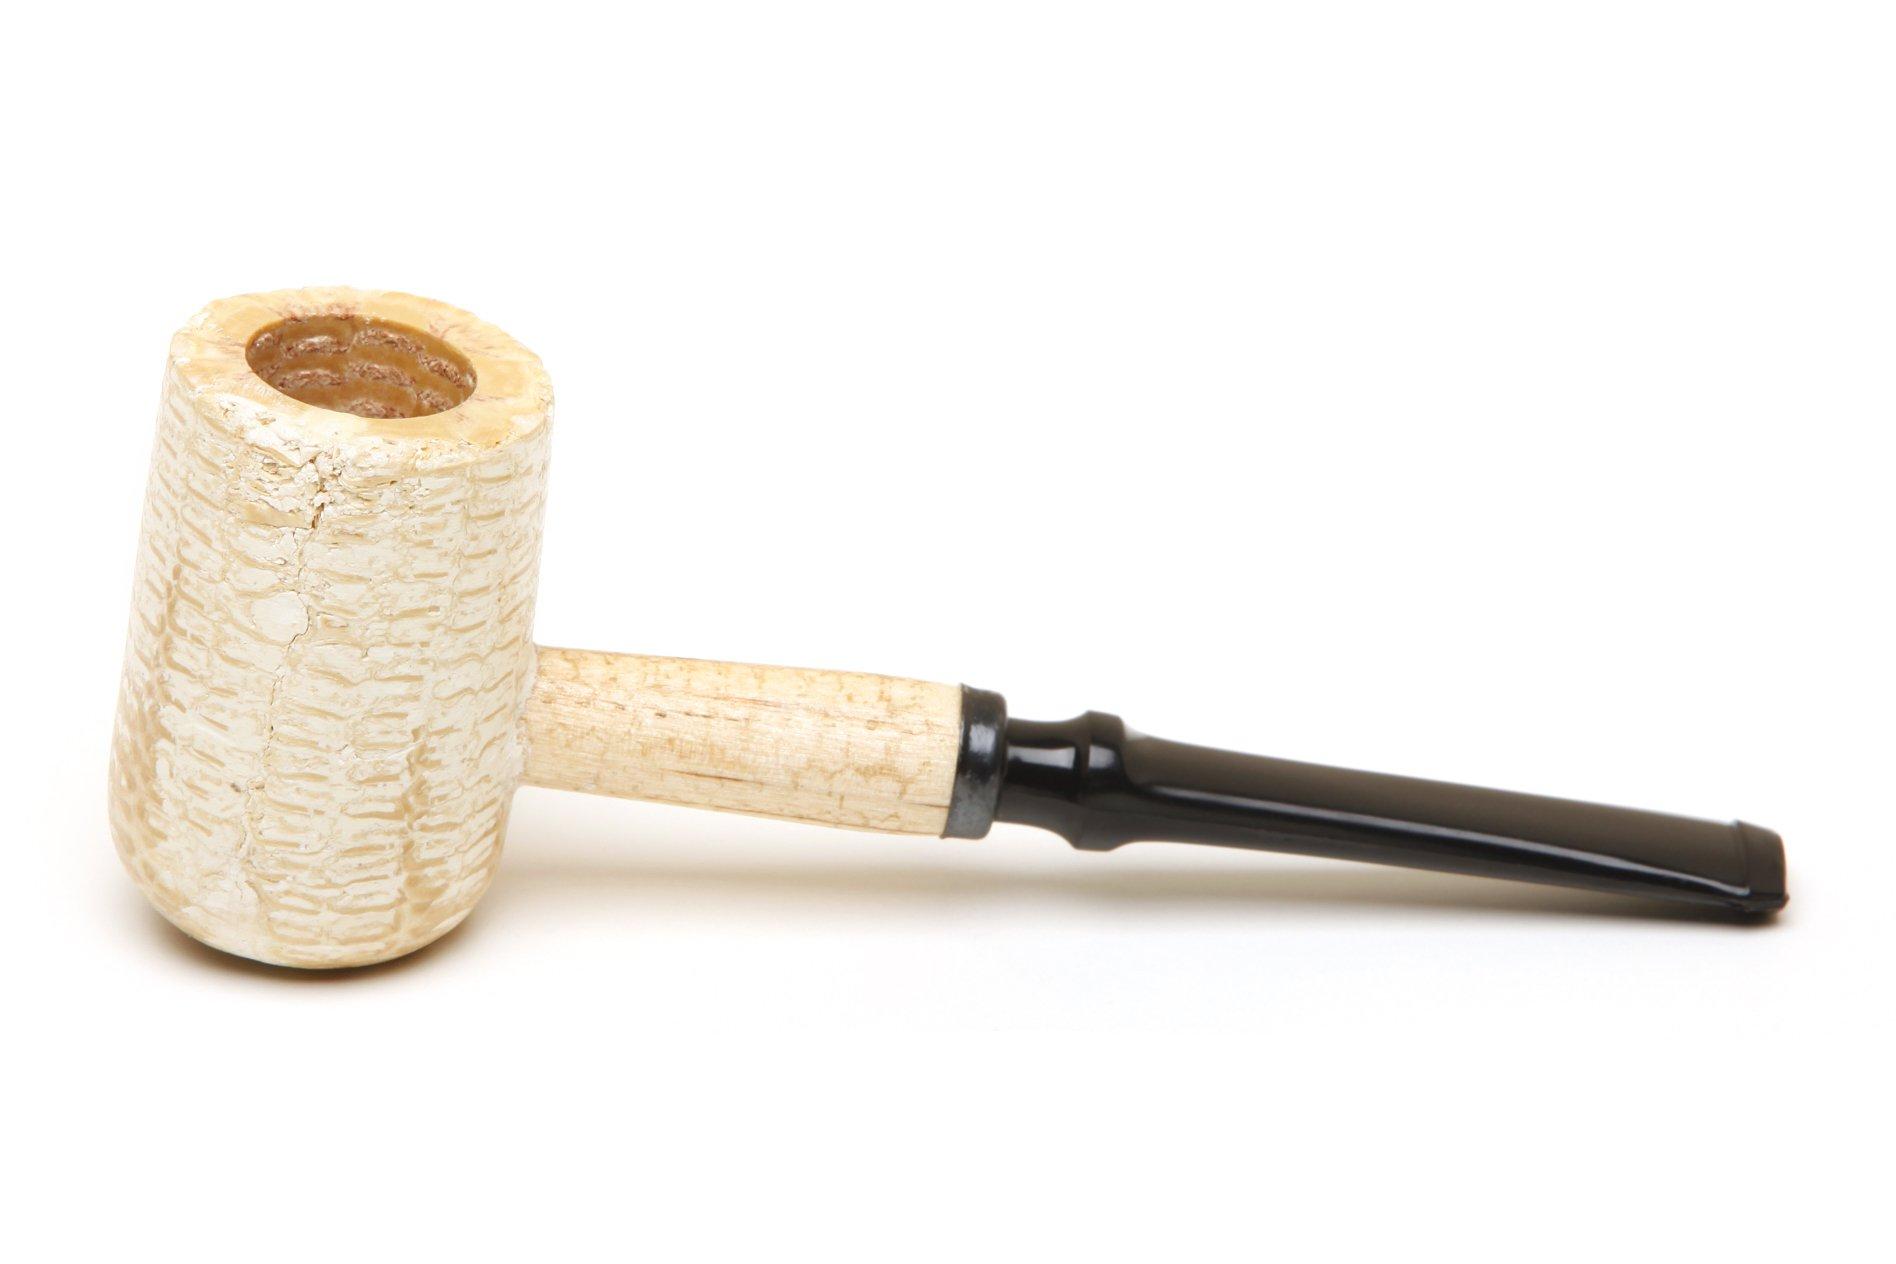 Missouri Meerschaum - Diplomat Corn Cob Tabacco Pipe - 5th Avenue, Straight Bit